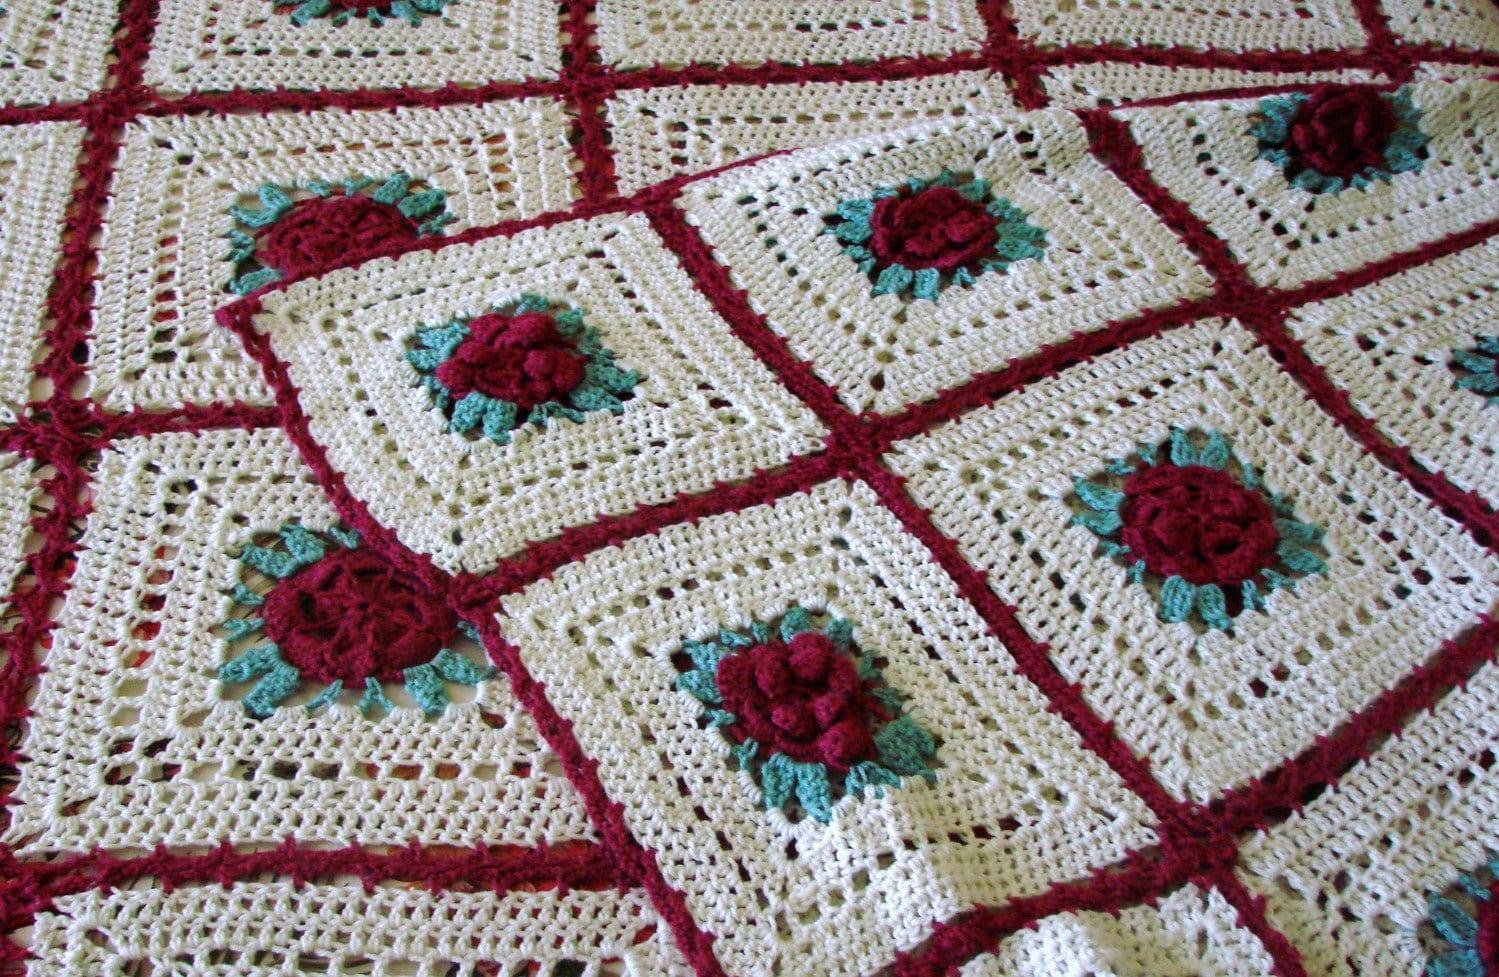 Red Irish Rose Crocheted Bedspread Afghan // King Queen